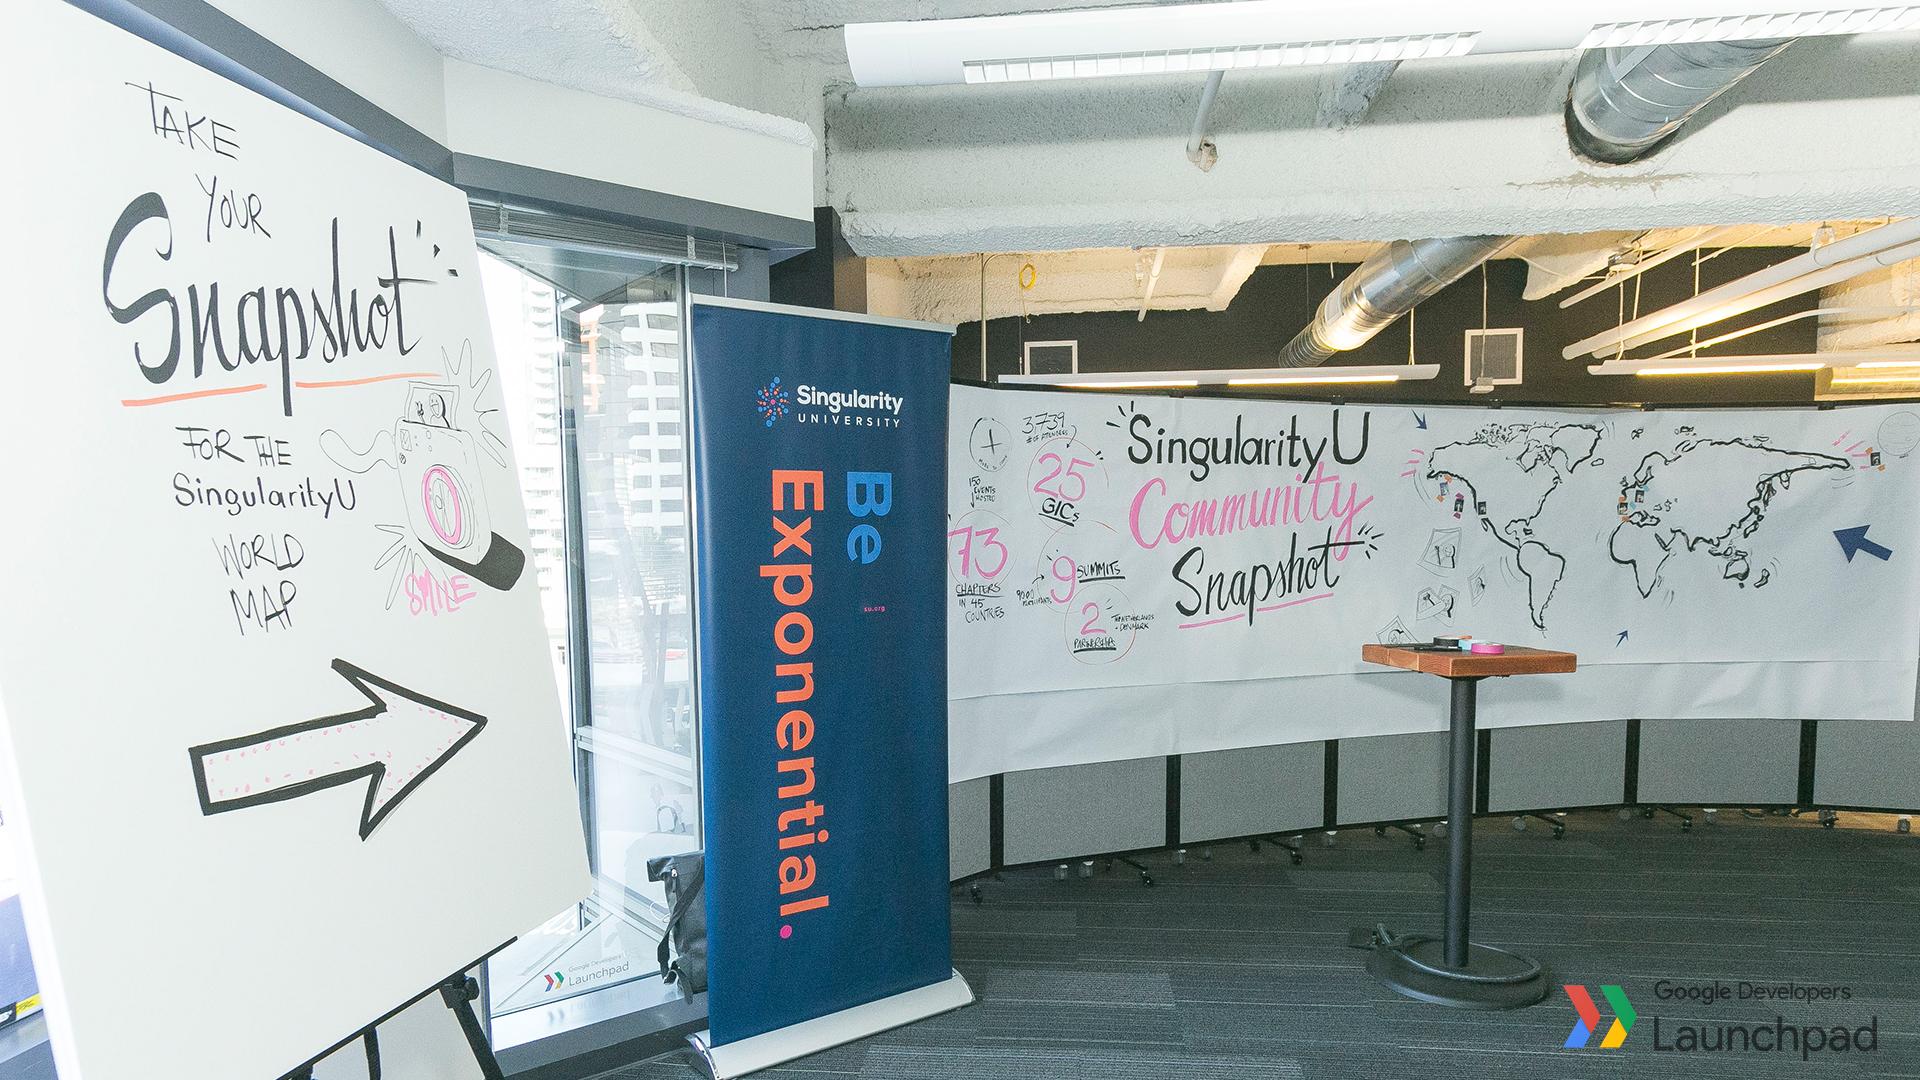 Kreatives_Singularity_Leadership_Google_WorldMap.jpg